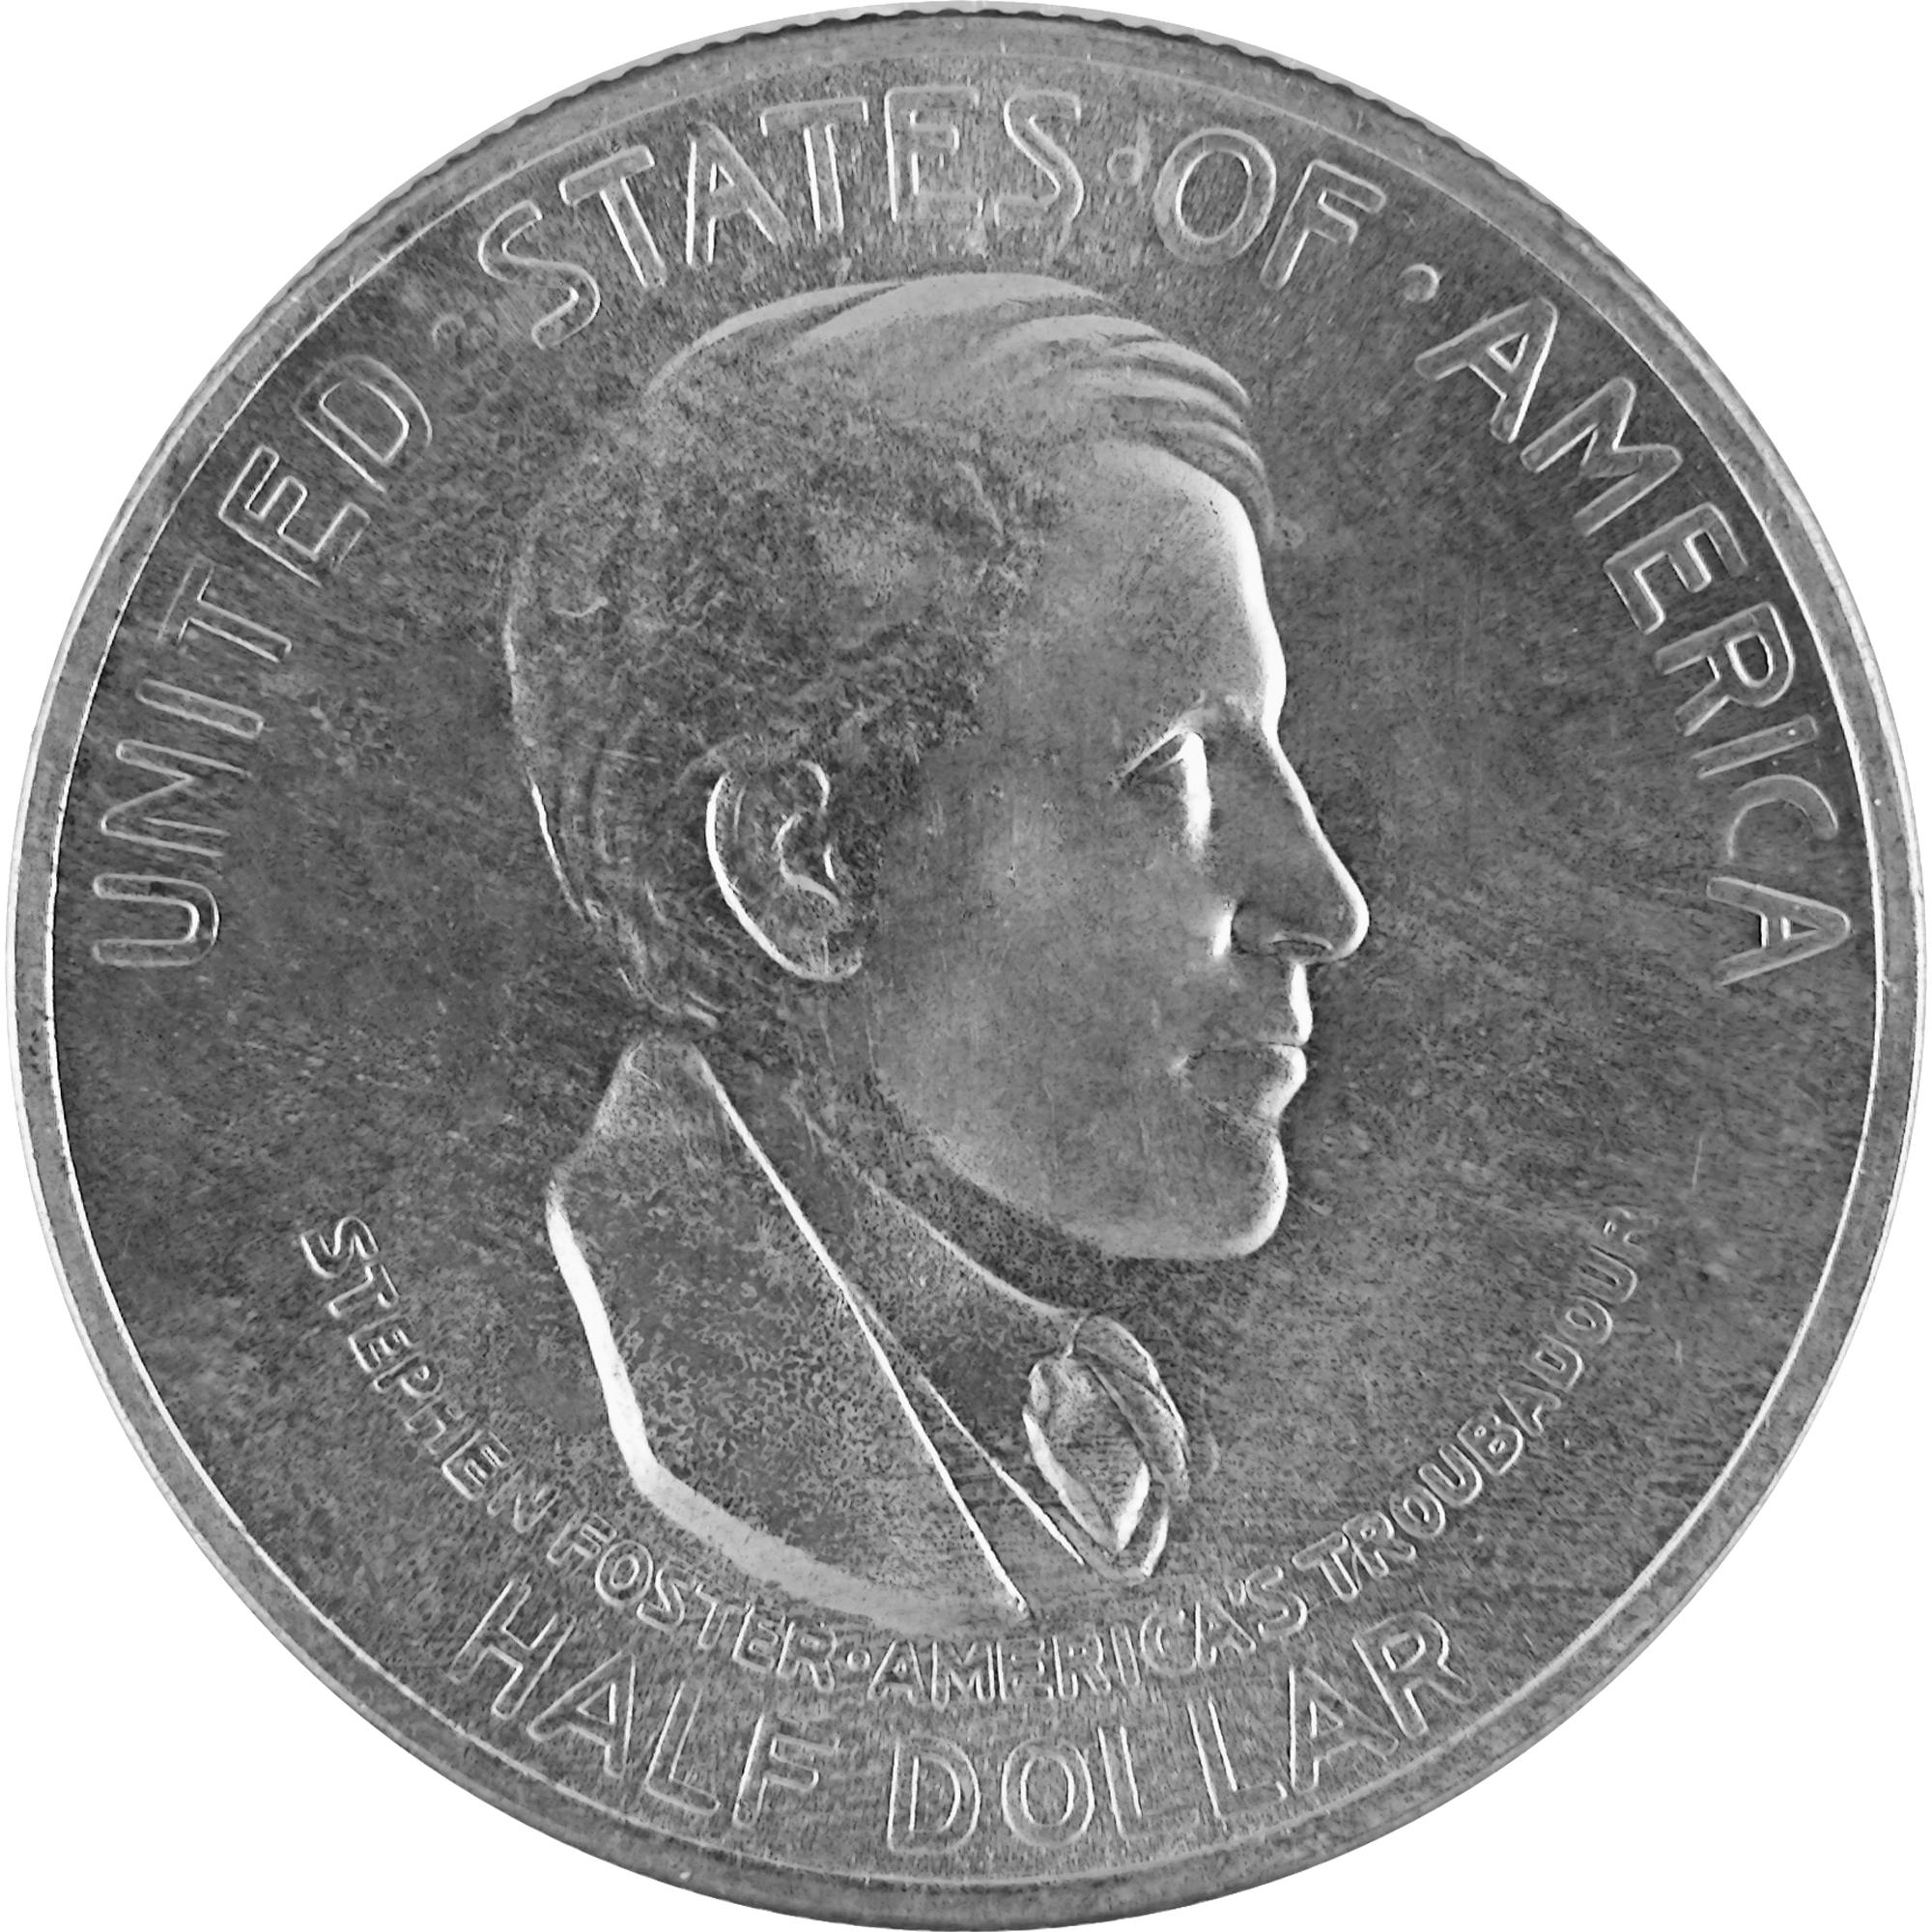 1936 Cincinnati Music Center Fiftieth Anniversary Commemorative Silver Half Dollar Coin Obverse